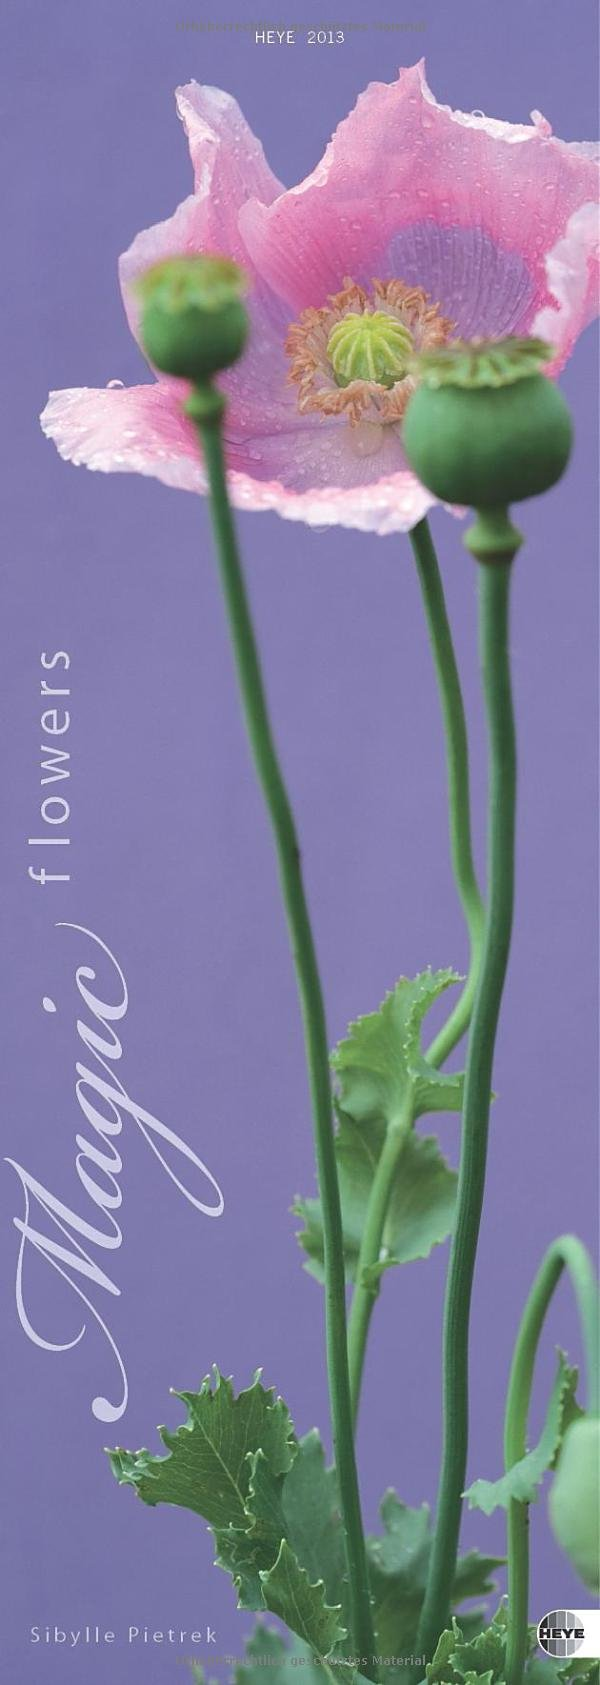 Magic Flowers Vertical 2013